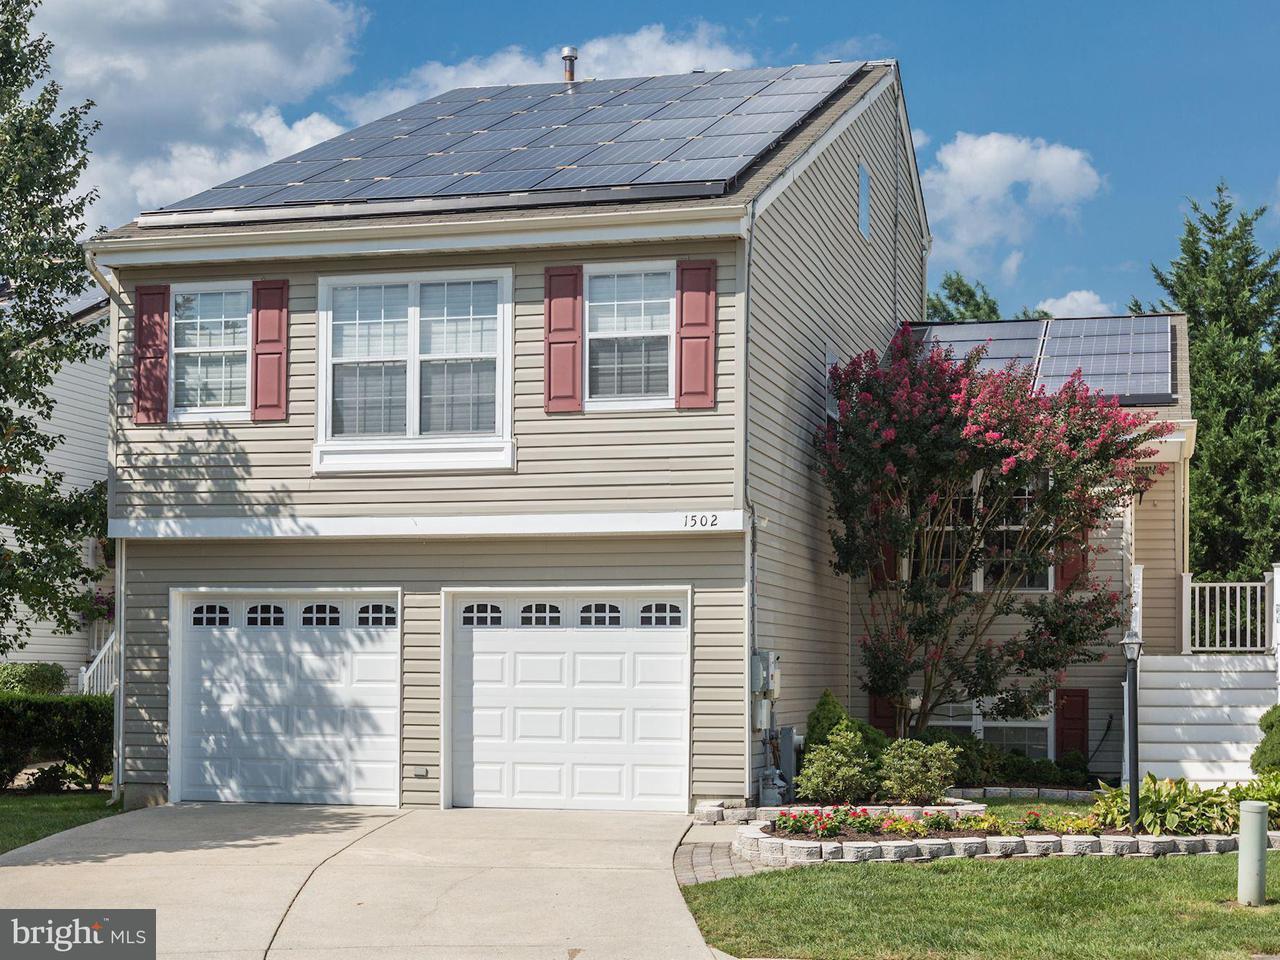 Single Family Home for Sale at 1502 SHADYWOOD Court 1502 SHADYWOOD Court Crofton, Maryland 21114 United States